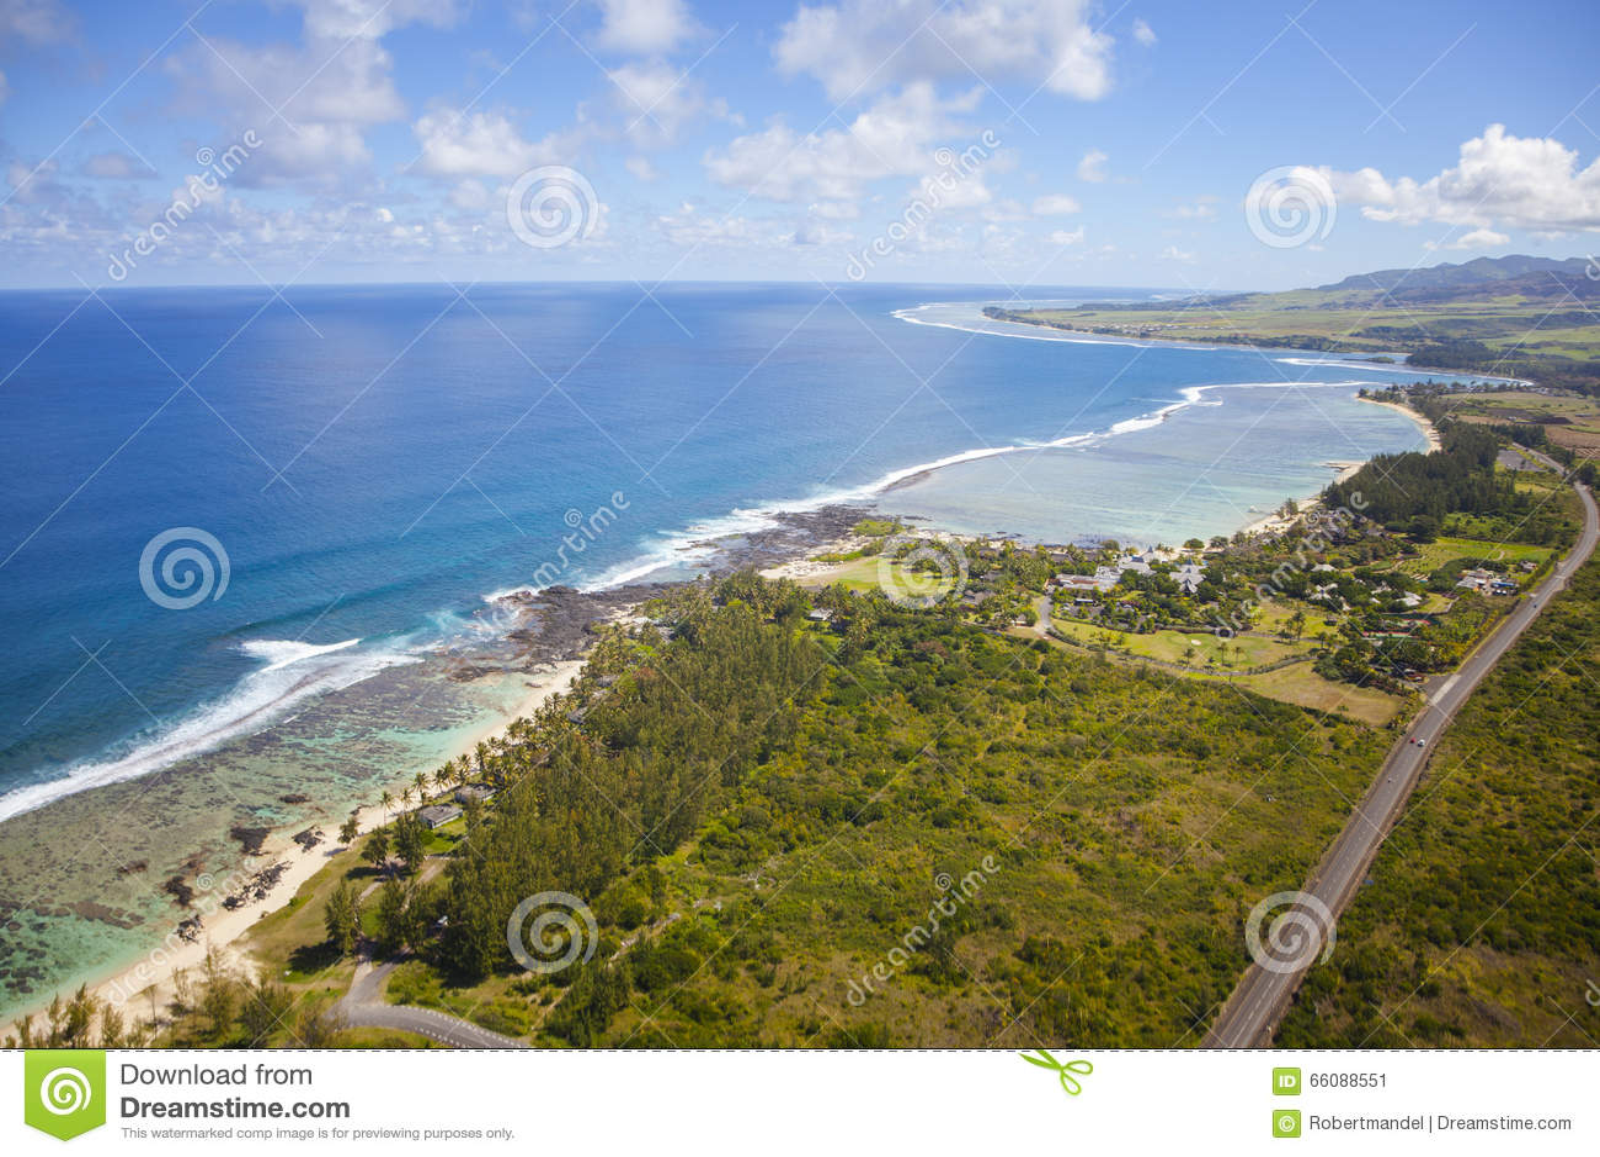 paradise island mauritius